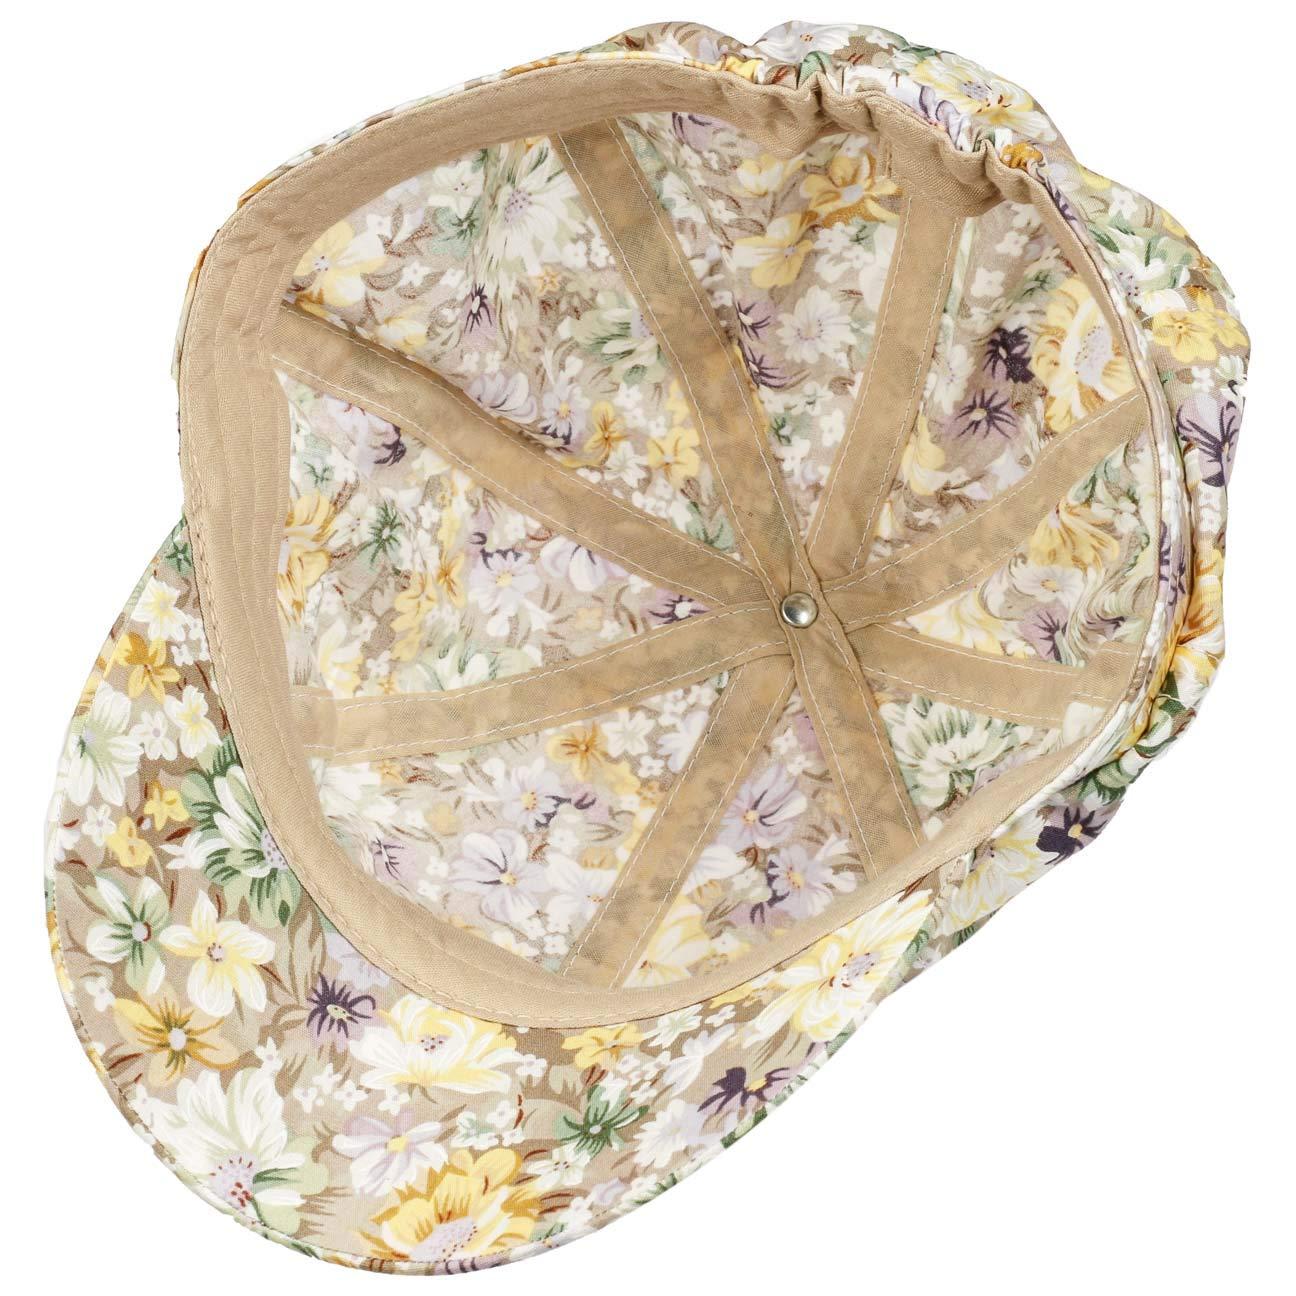 mit Schirm Fr/ühling-Sommer Lipodo Limasetta Flowers Ballonm/ütze Damencap Baumwollcap Schildm/ütze Baker-Boy-M/ütze Damen